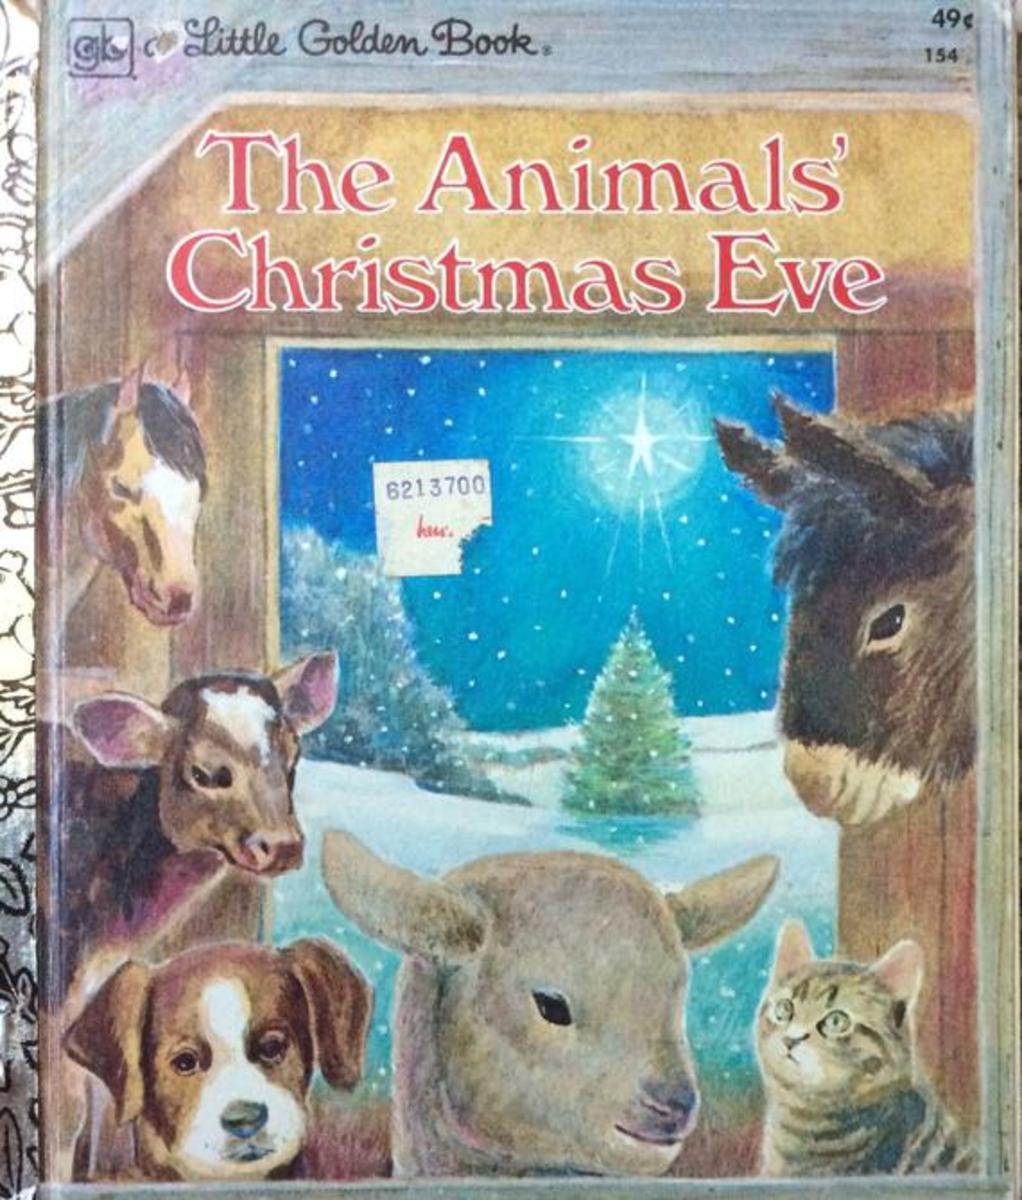 The Origin of Celebrating Christmas in July